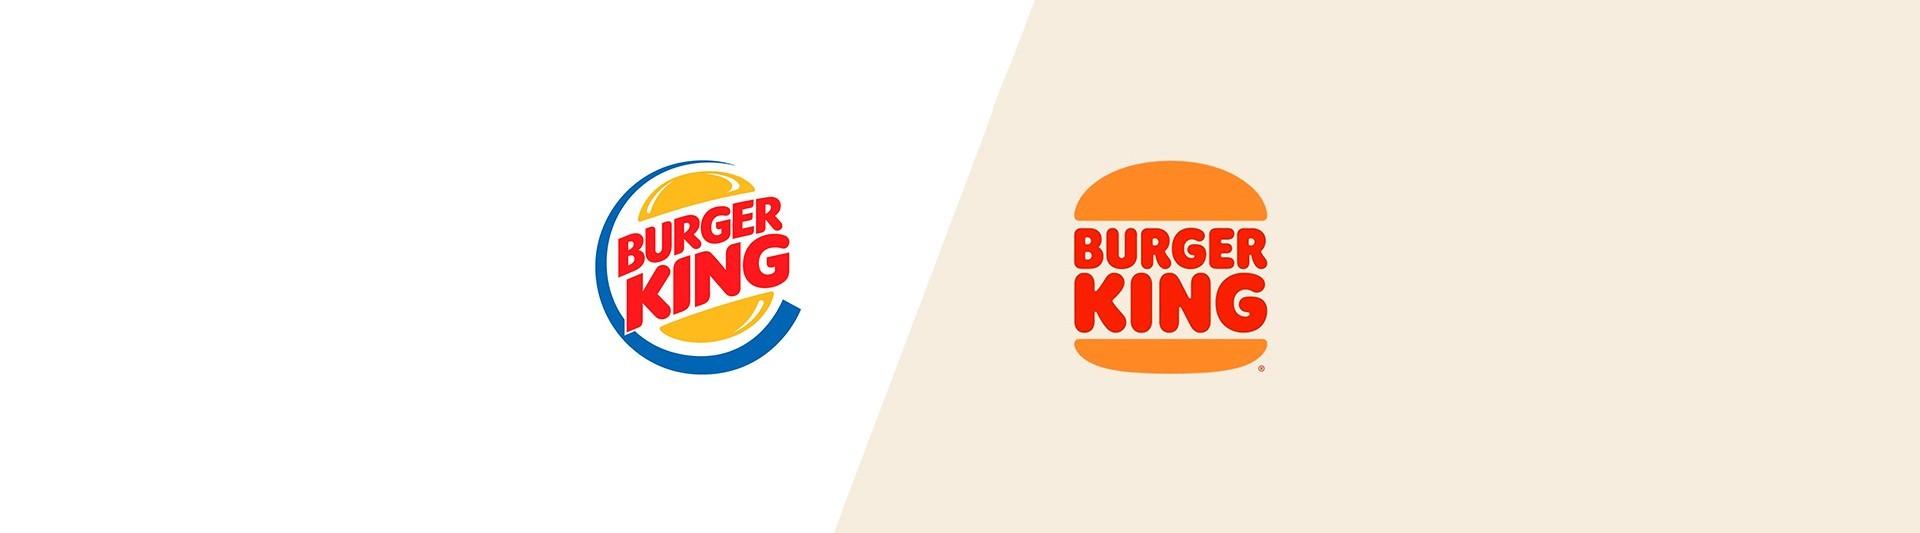 Rebrand de Burger King para 2021